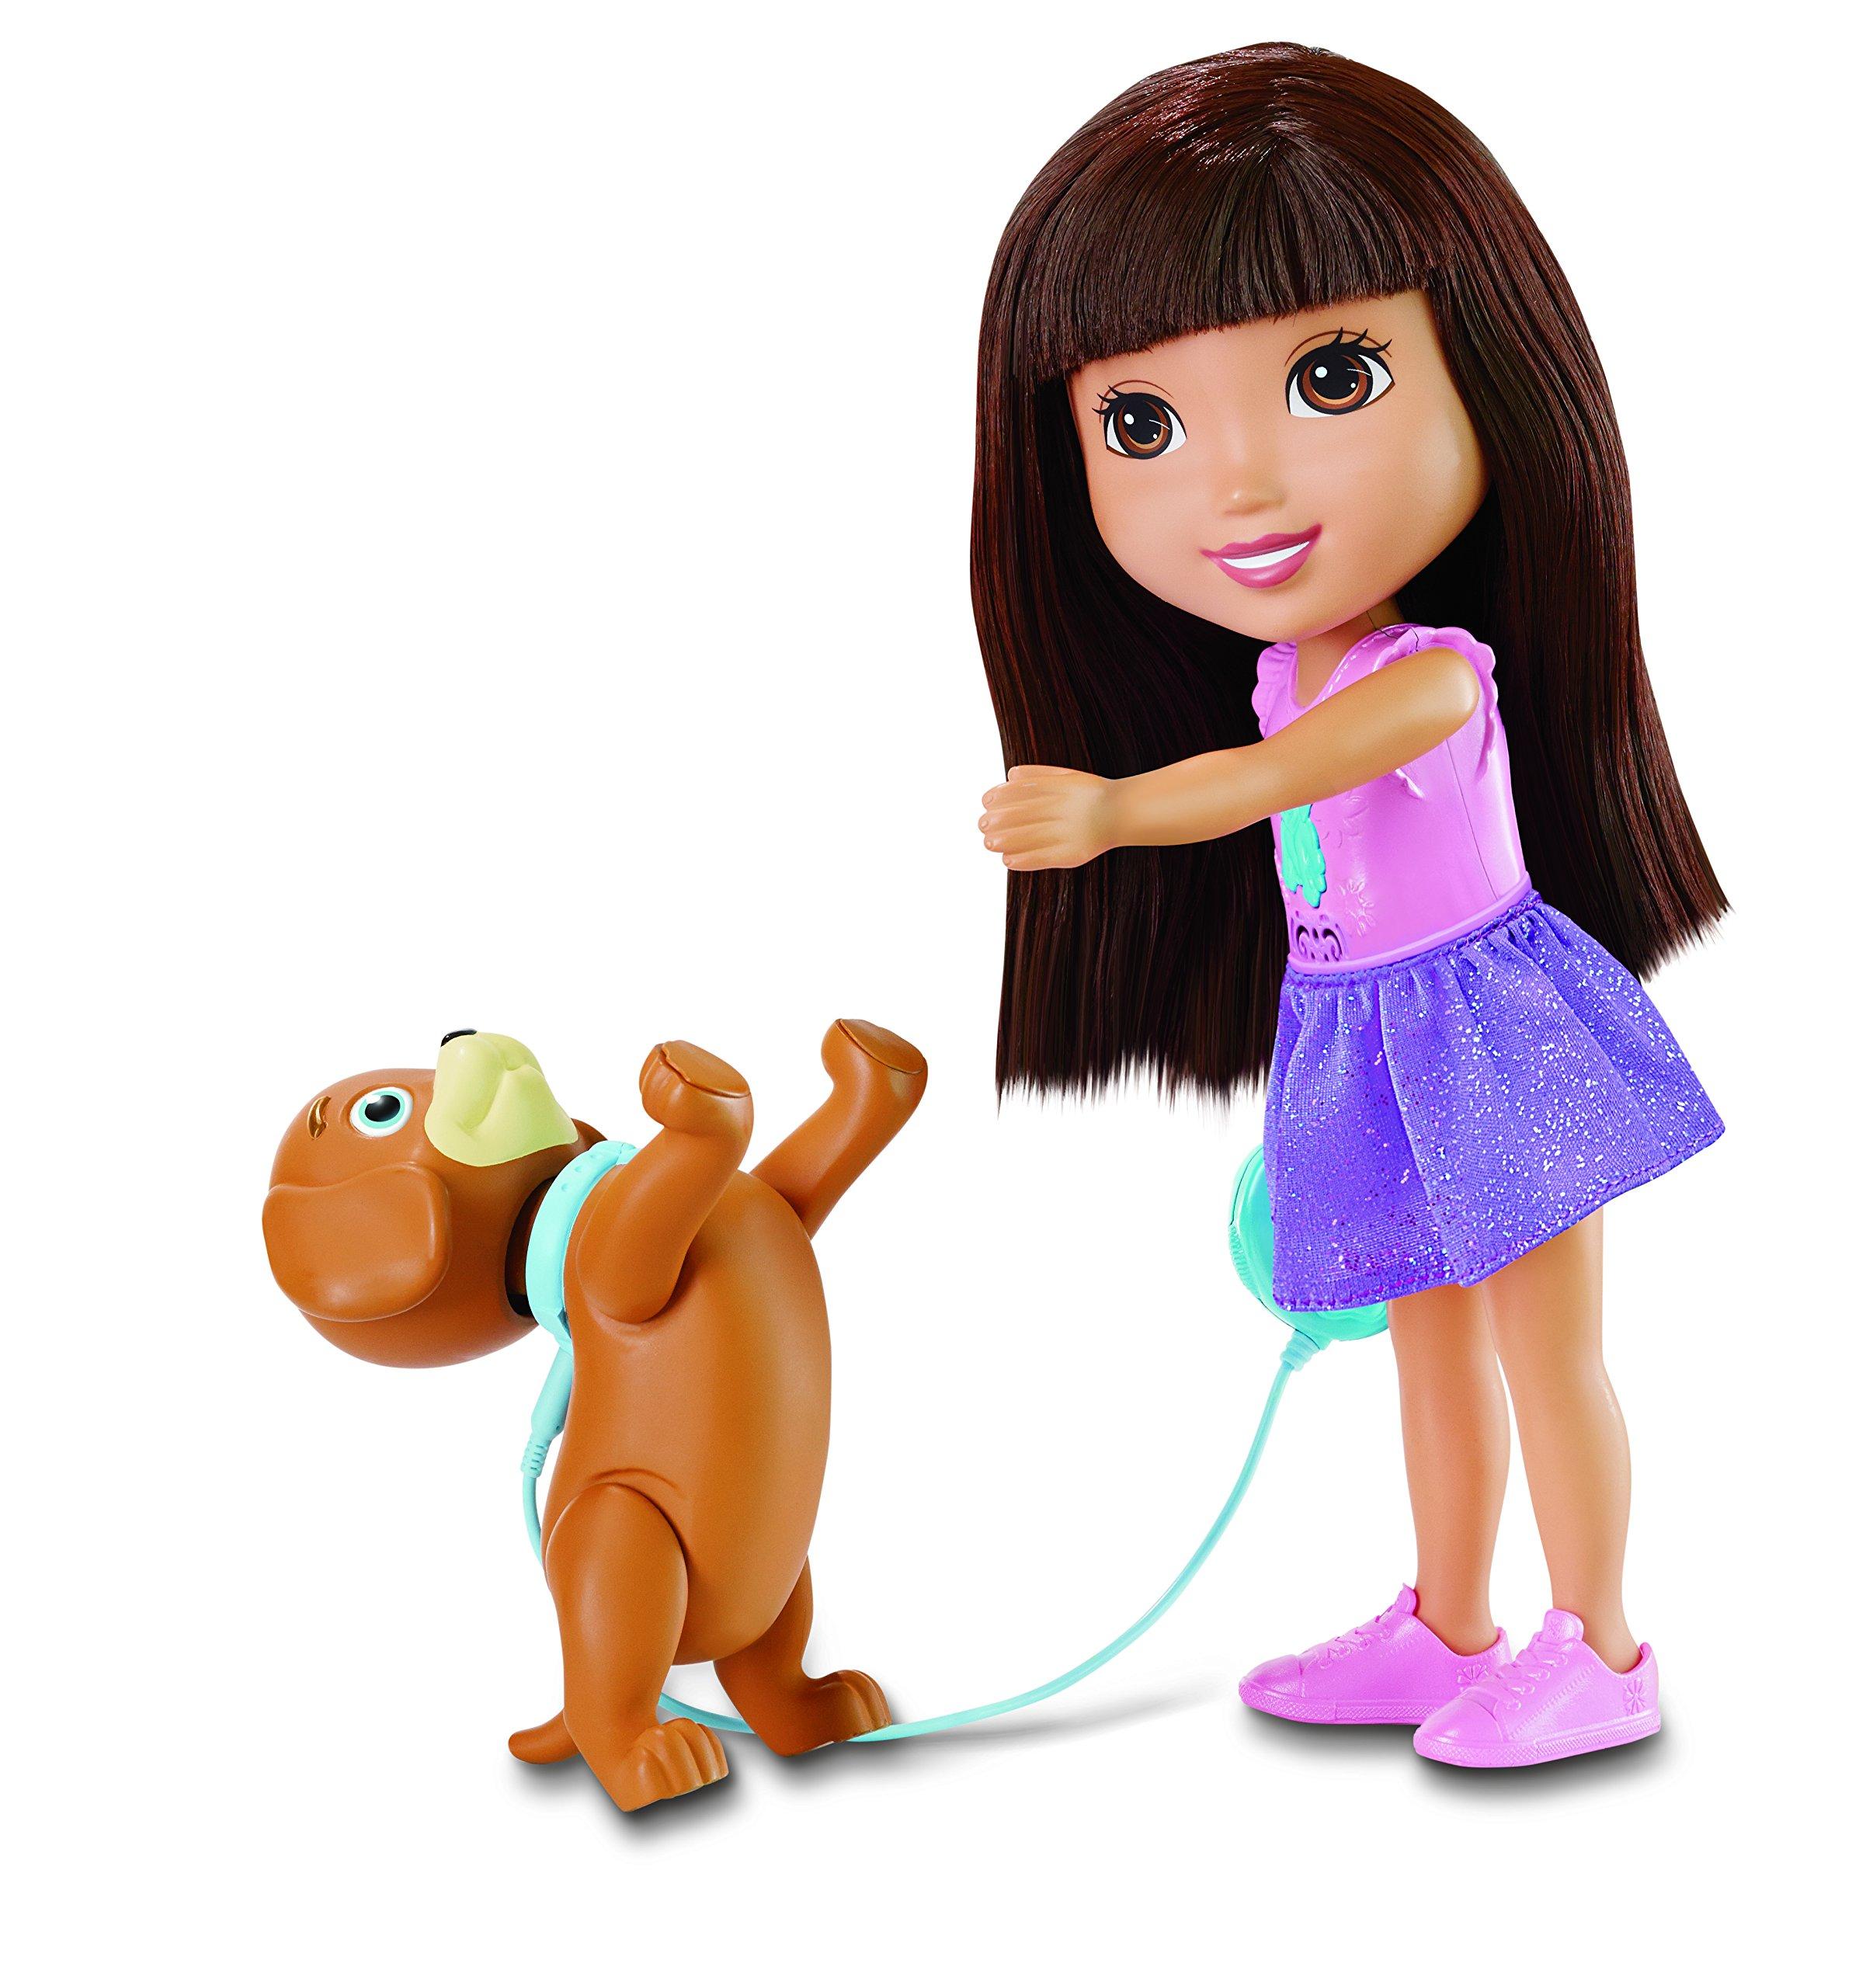 Dora - DKF87 - Son Chiot Savant product image